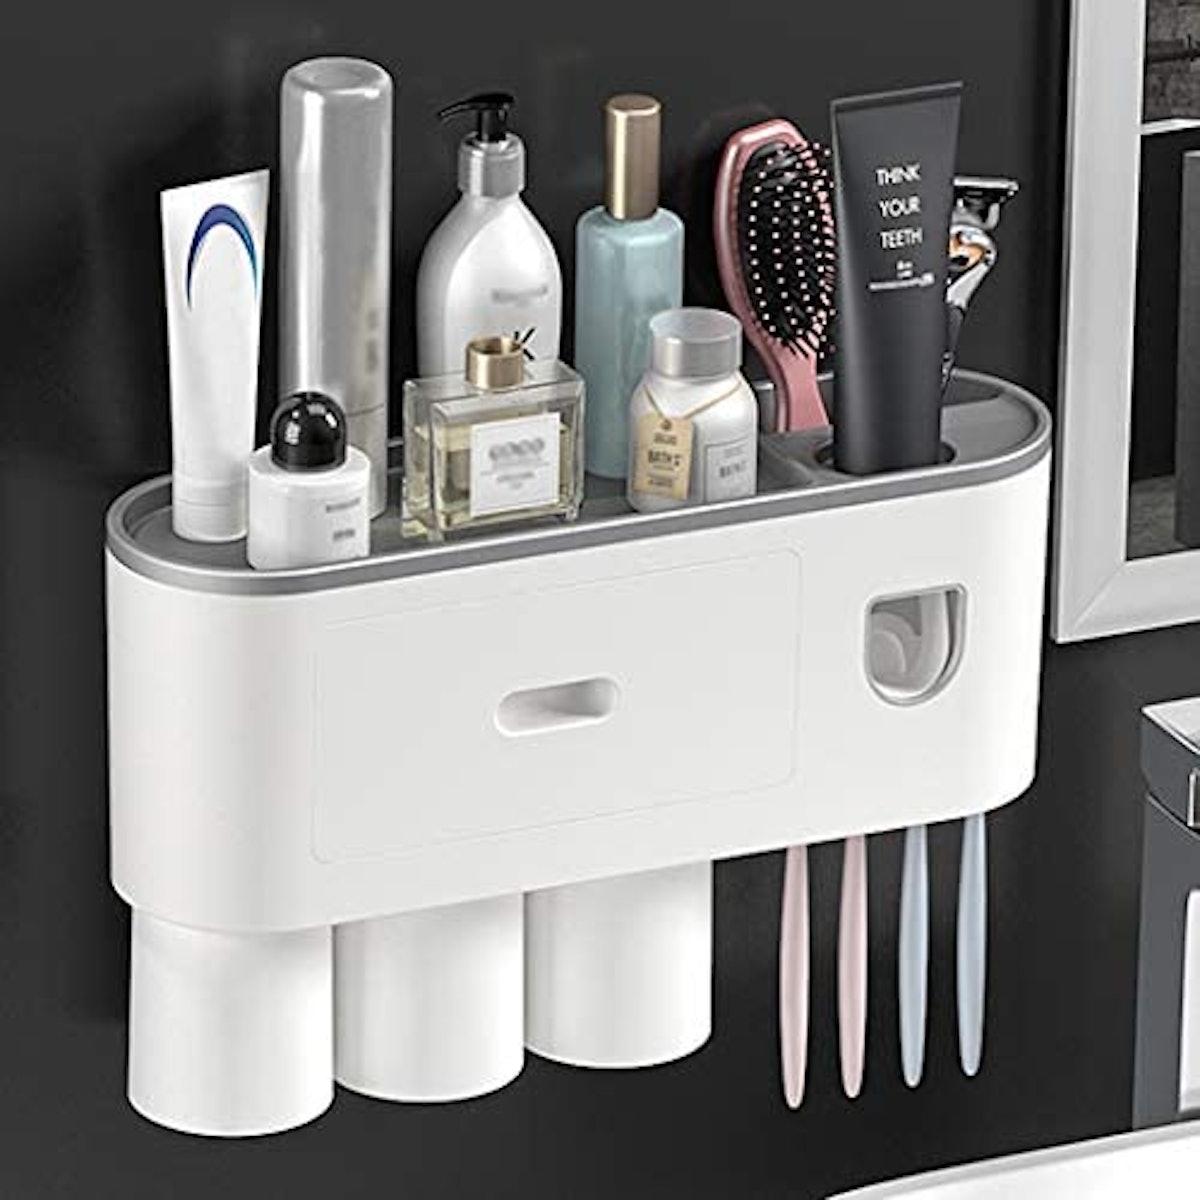 BUILDEC Toothbrush Holder and Shelf